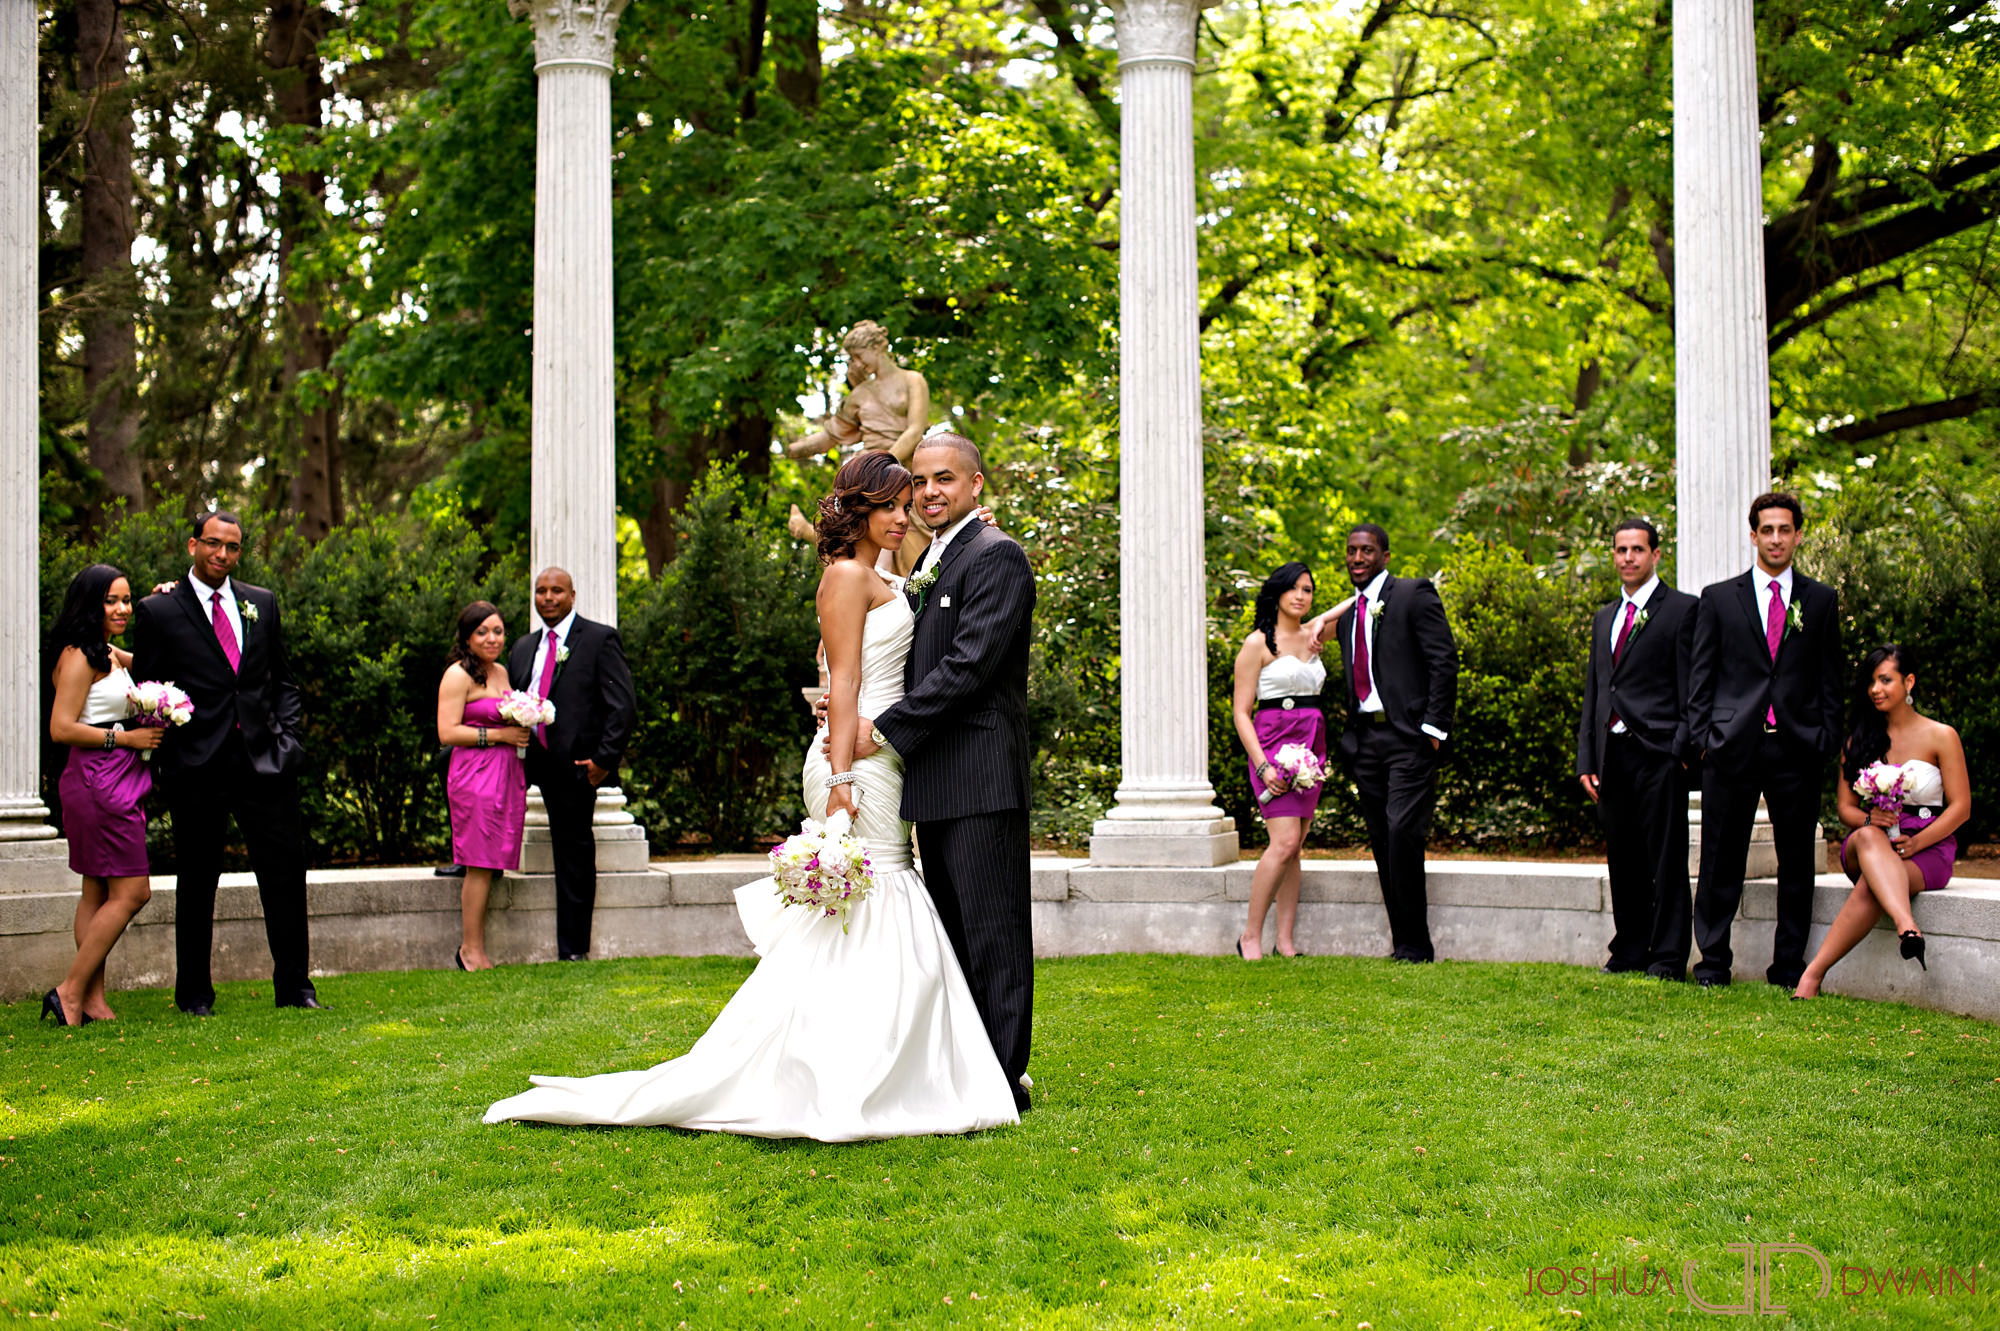 carolina-hector-011-chateau-briandlong-island-new-york-wedding-photographer-joshua-dwain-2011-05-13_ch_0374